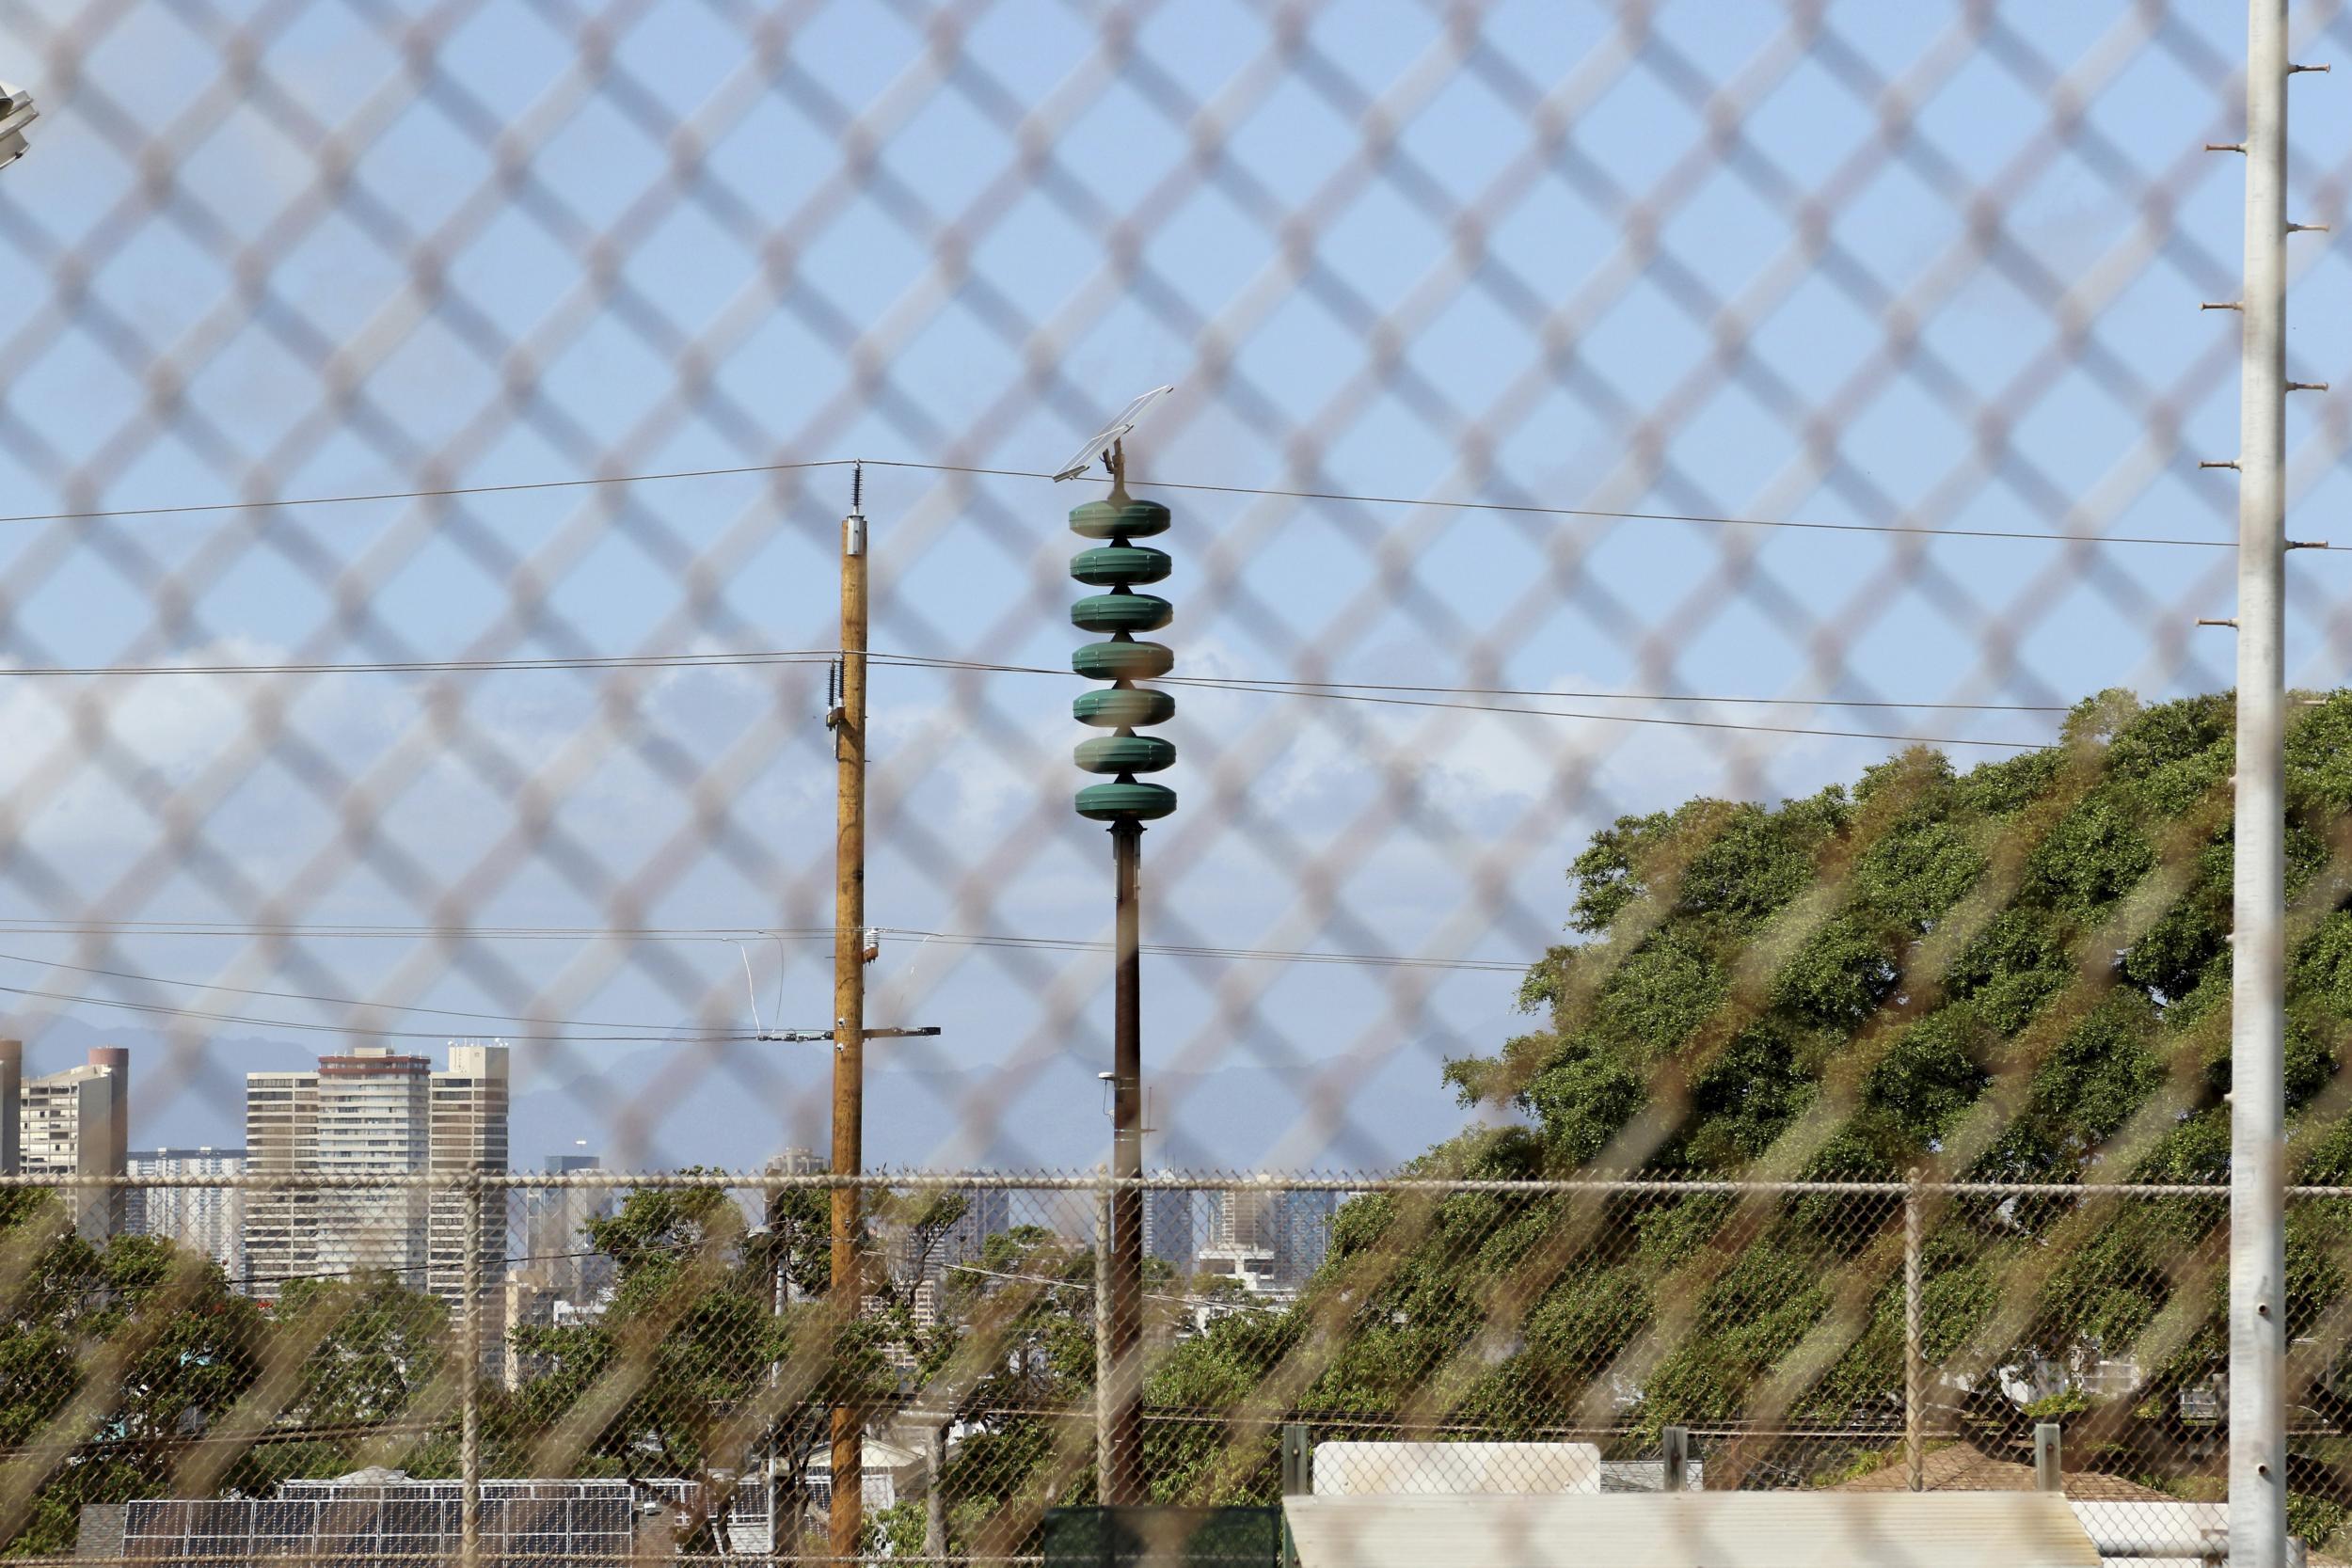 hawaii ballistic missile alert latest employee sent terrifying